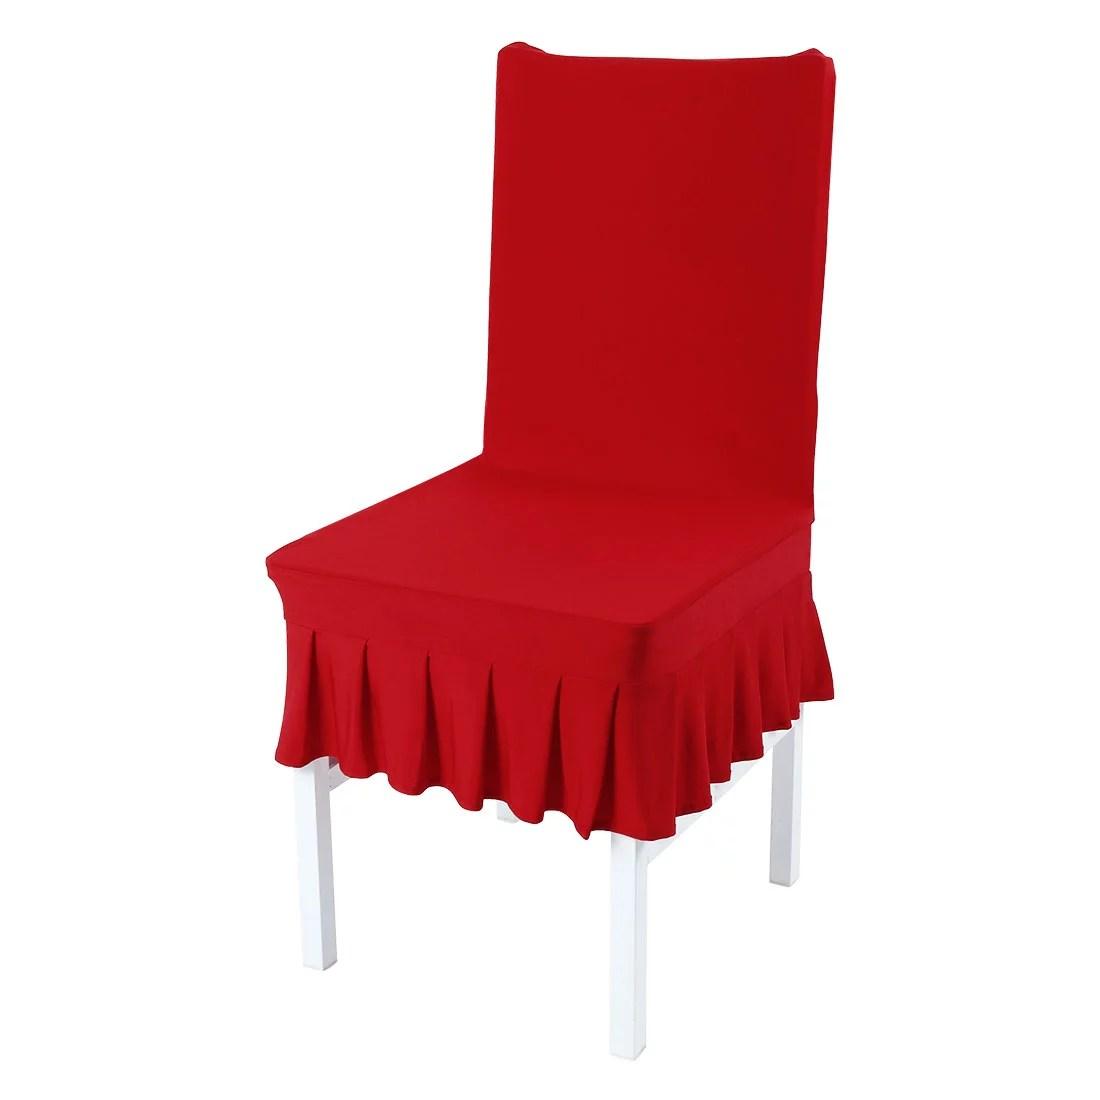 santa chair covers australia upholstered chairs dining walmart com product image piccocasa spandex room skirt slipcover